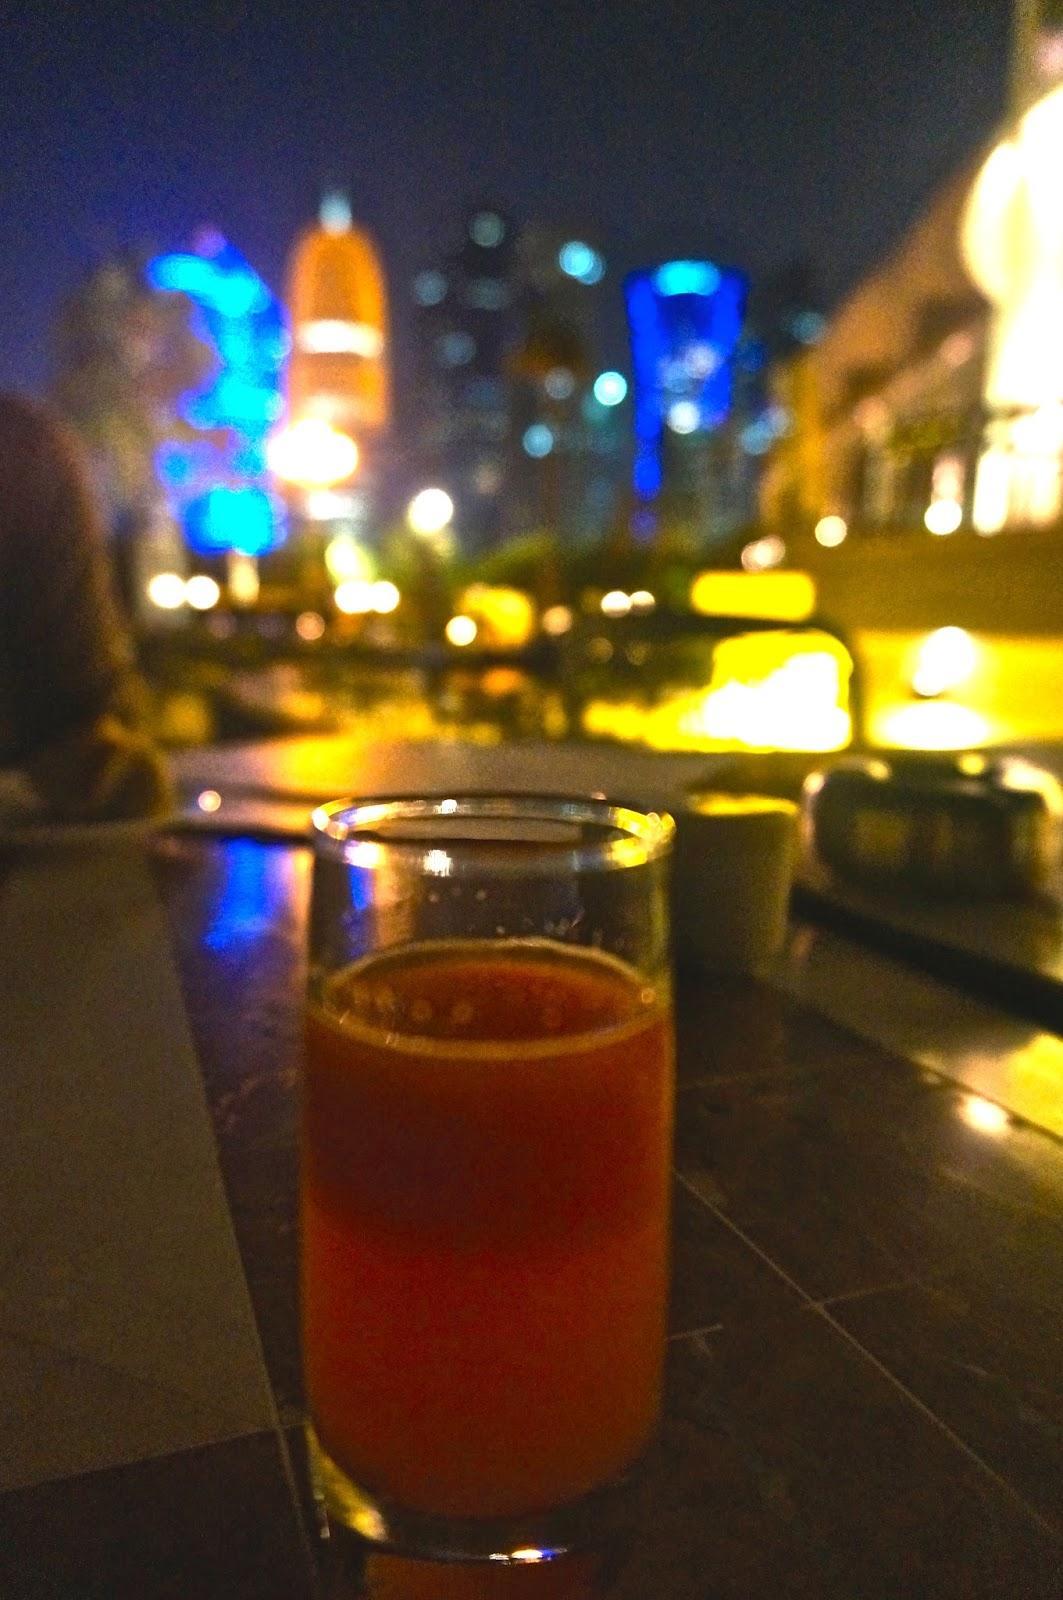 Dining With A View: La Veranda at The Sheraton, Doha